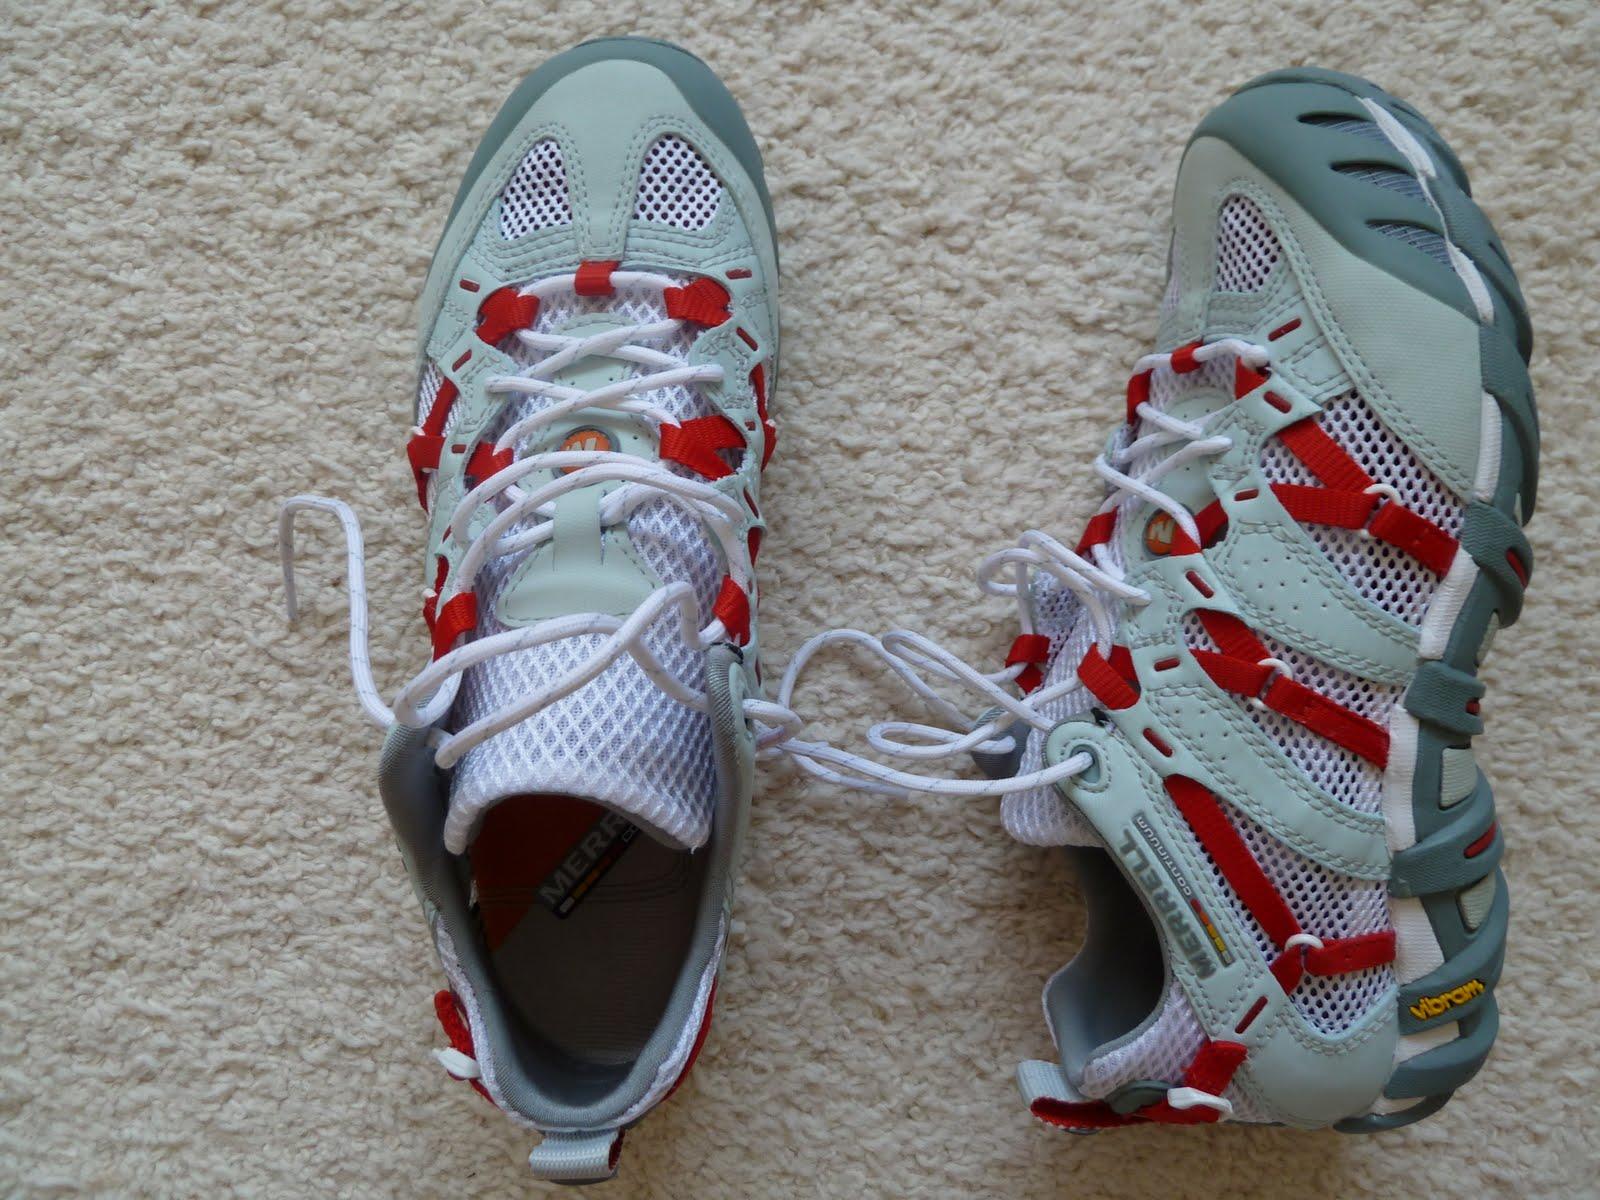 snygga skor för hallux valgus